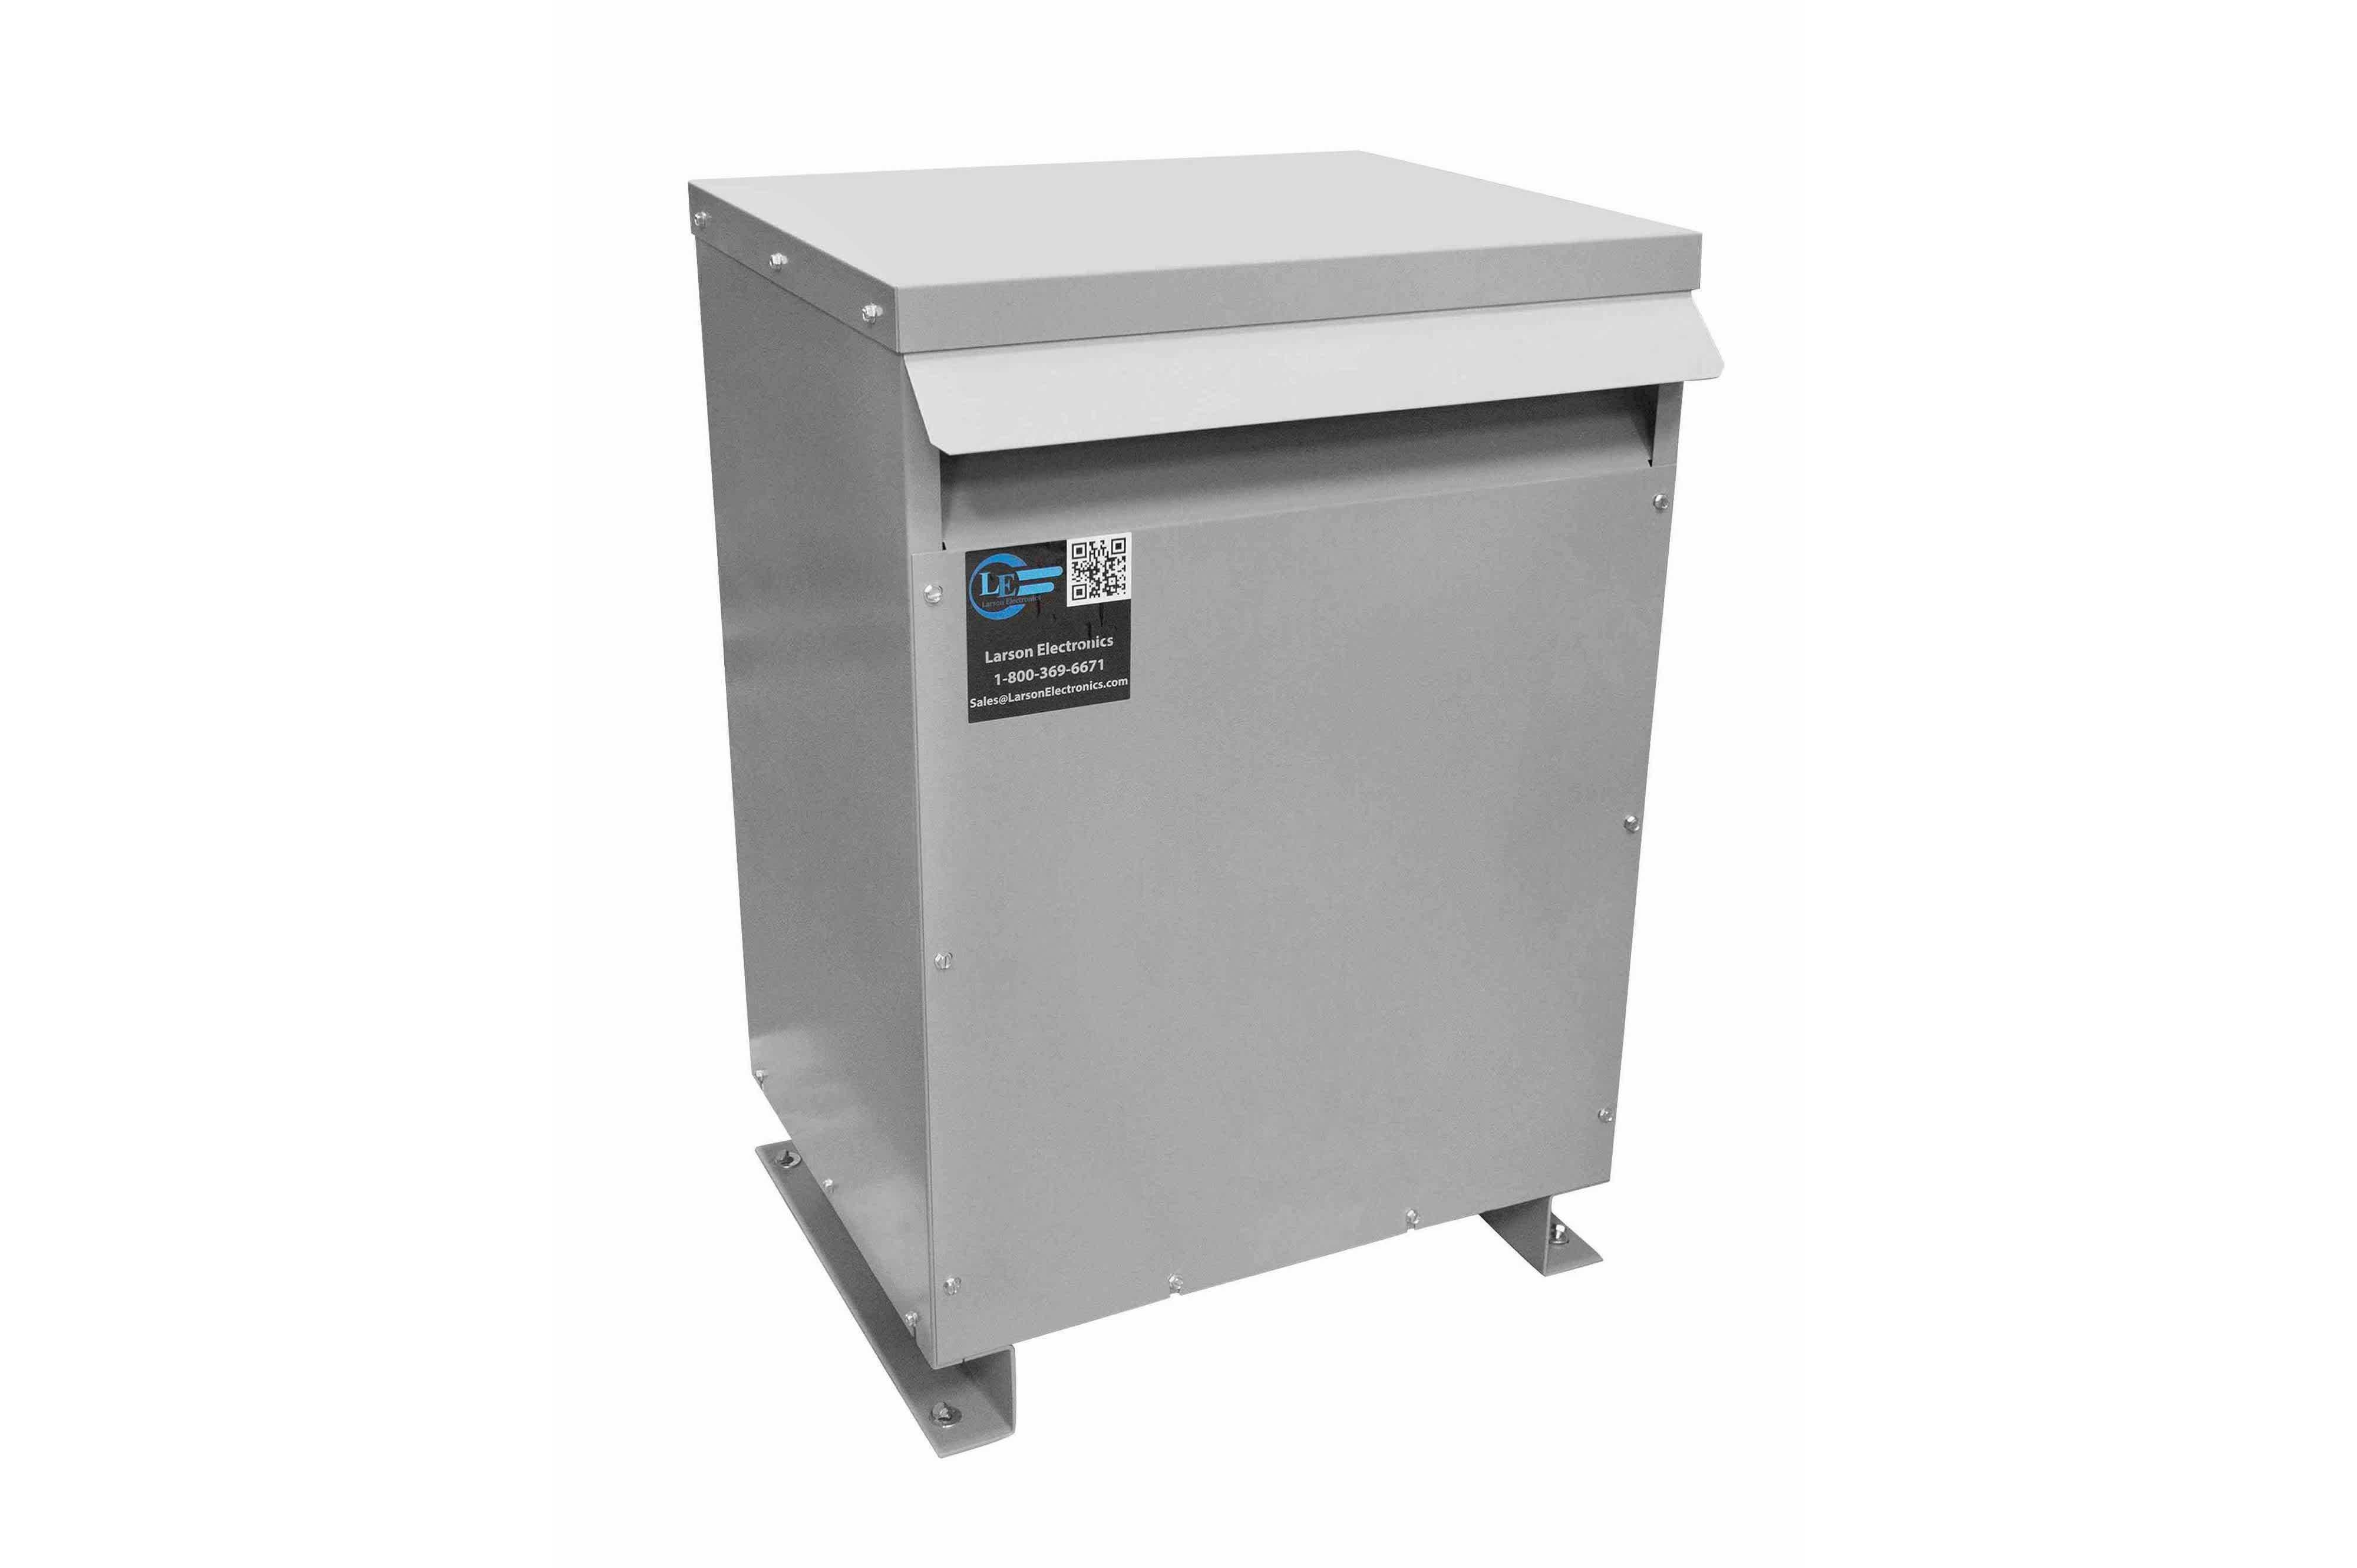 22.5 kVA 3PH Isolation Transformer, 380V Wye Primary, 208Y/120 Wye-N Secondary, N3R, Ventilated, 60 Hz